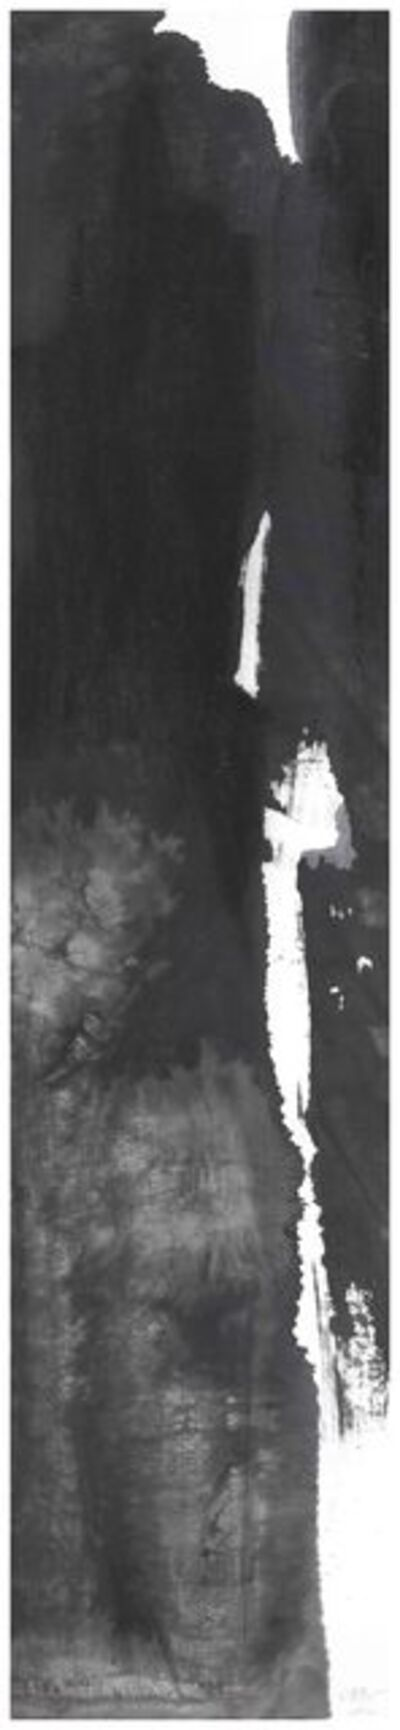 Wang Gongyi, 'Minimalistic Landscape', 2012